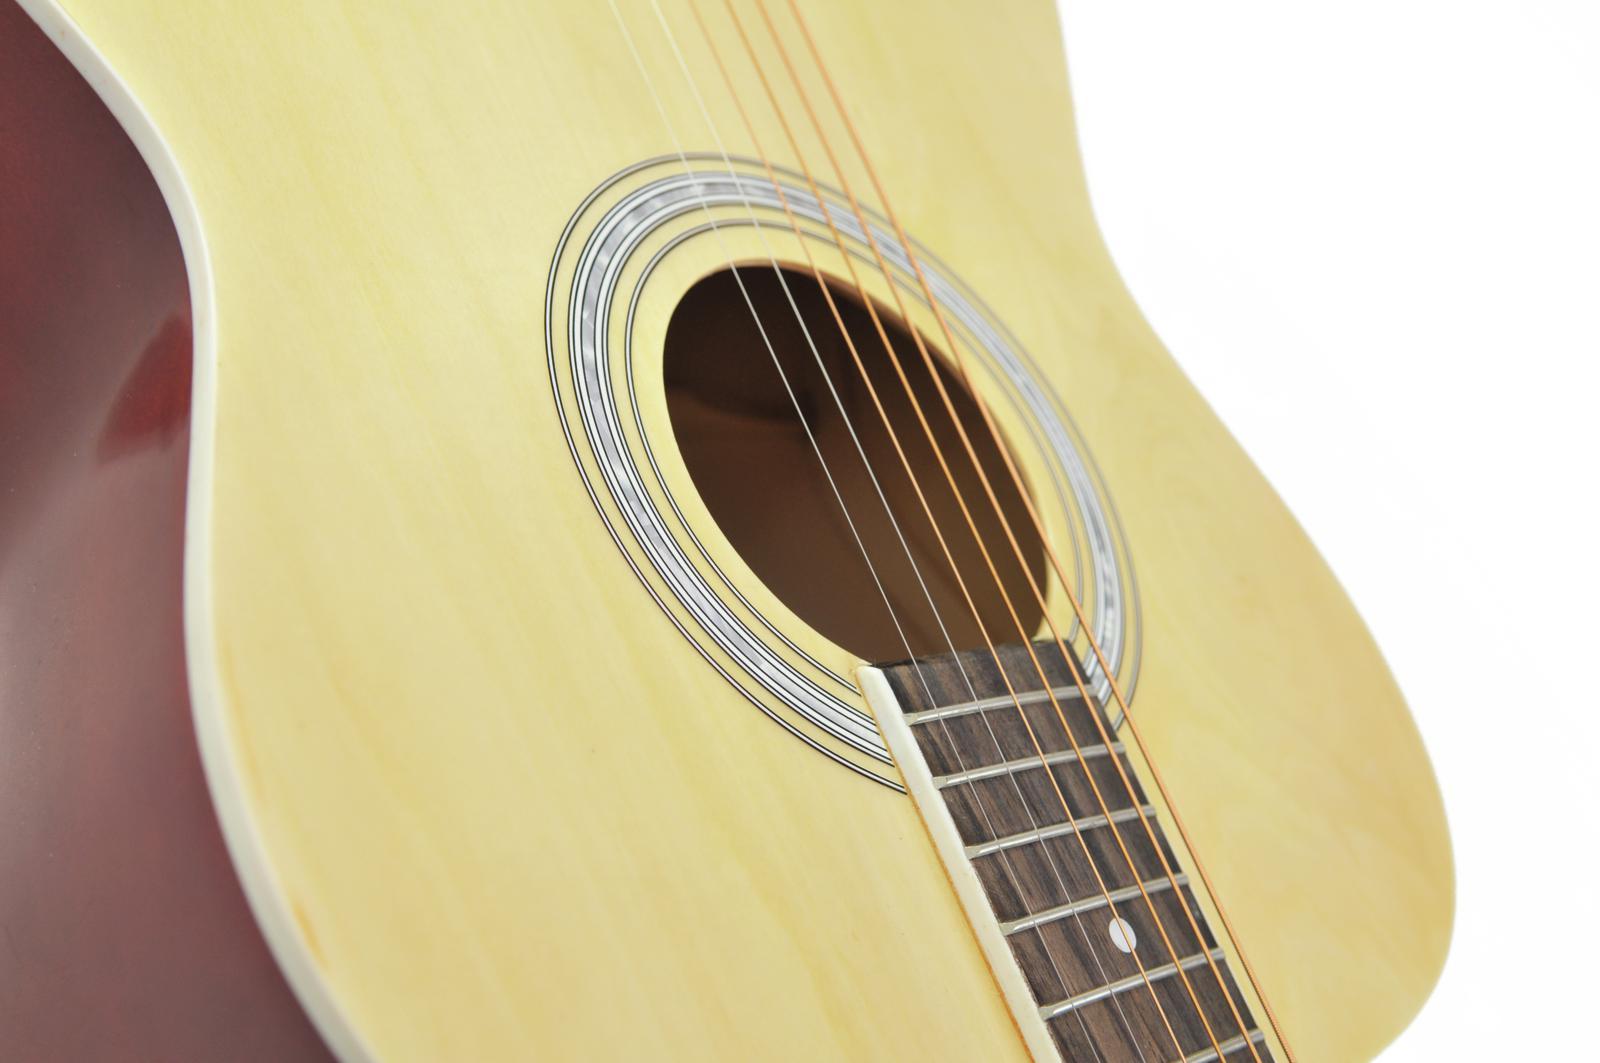 Chitarra acustica, western, colore natura, acero, DIMAVERY AW-303